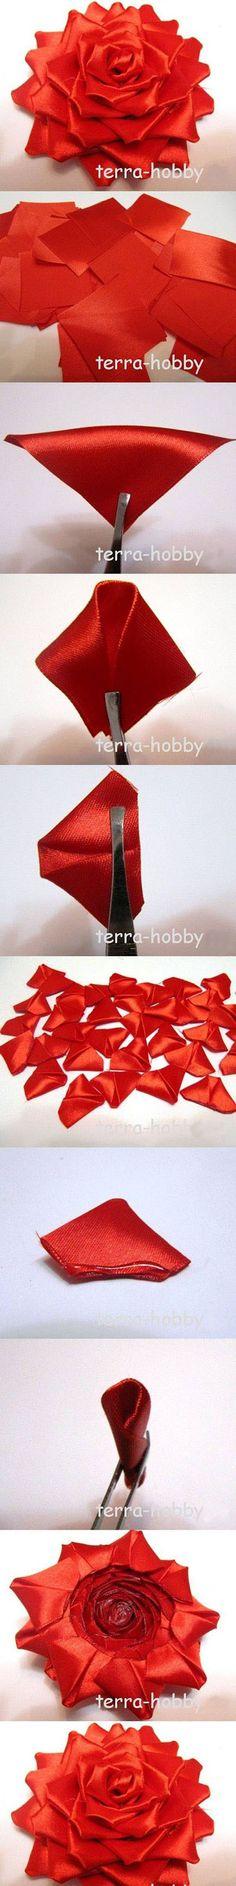 Diy Beautiful Red Flower | DIY & Crafts Tutorials